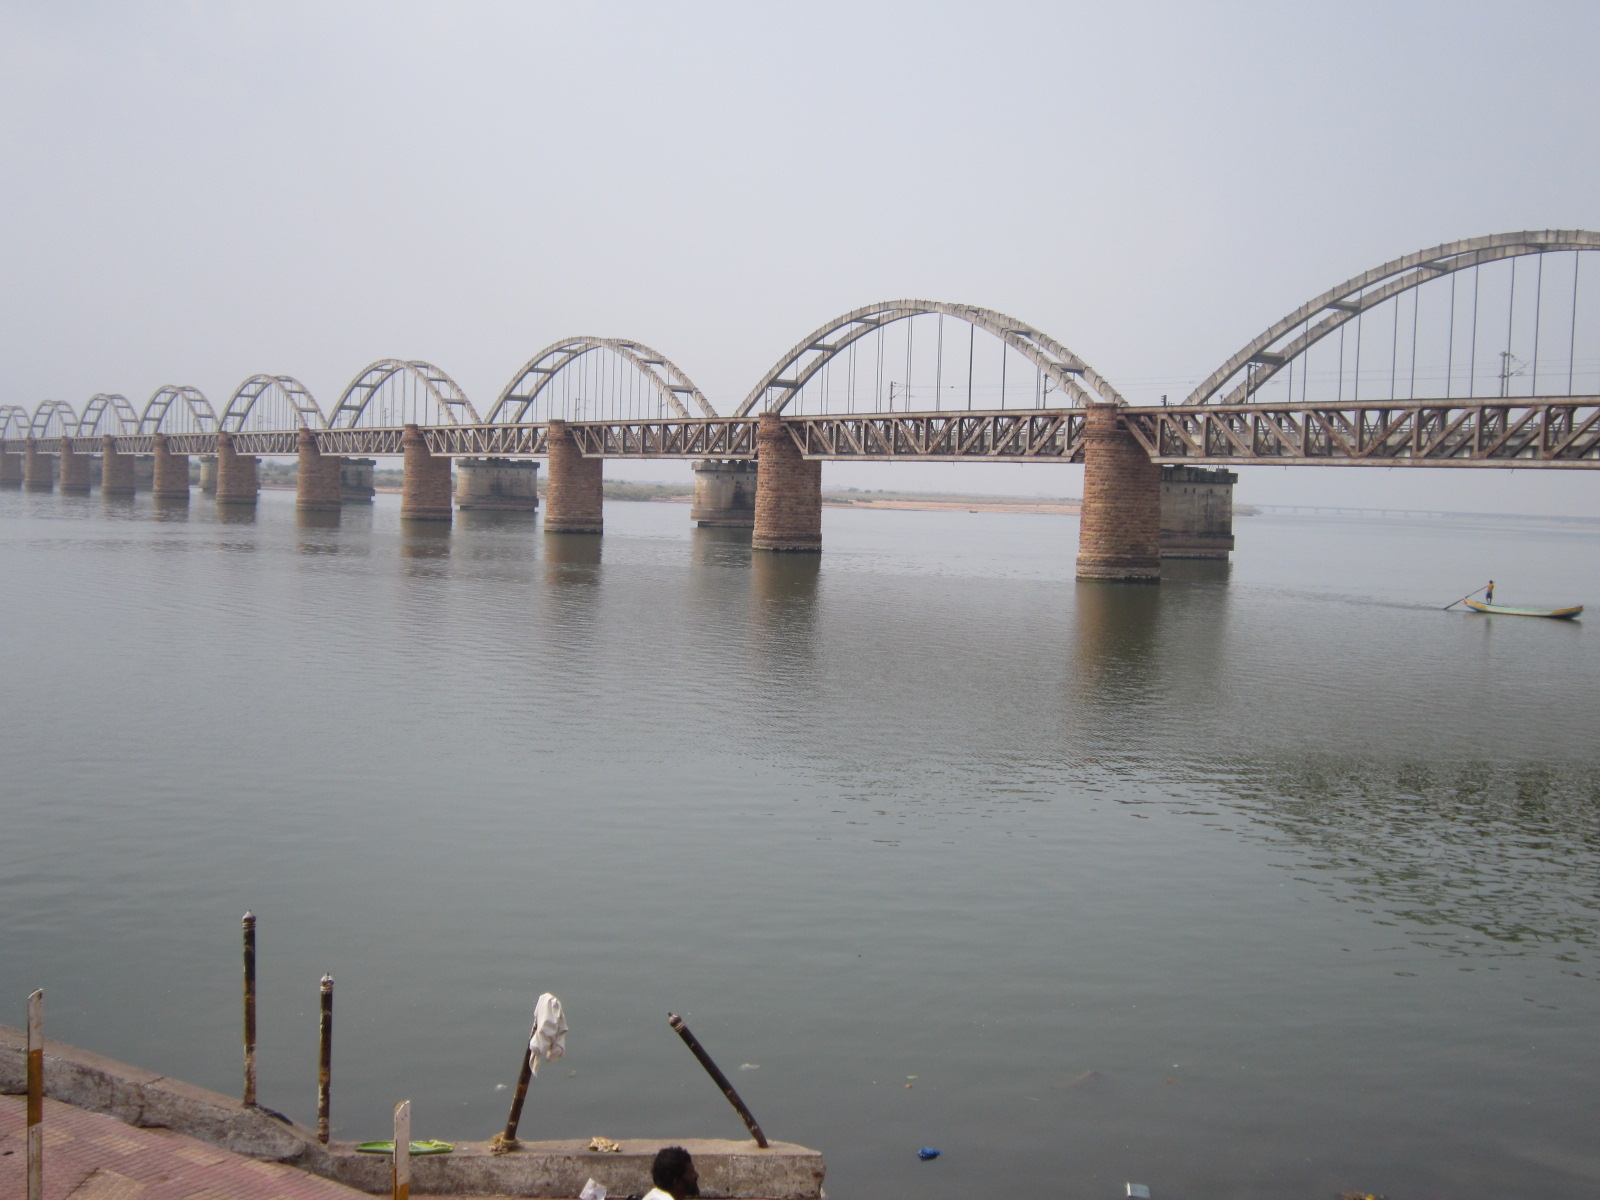 filerailway bridge on river godavari near rajamundry